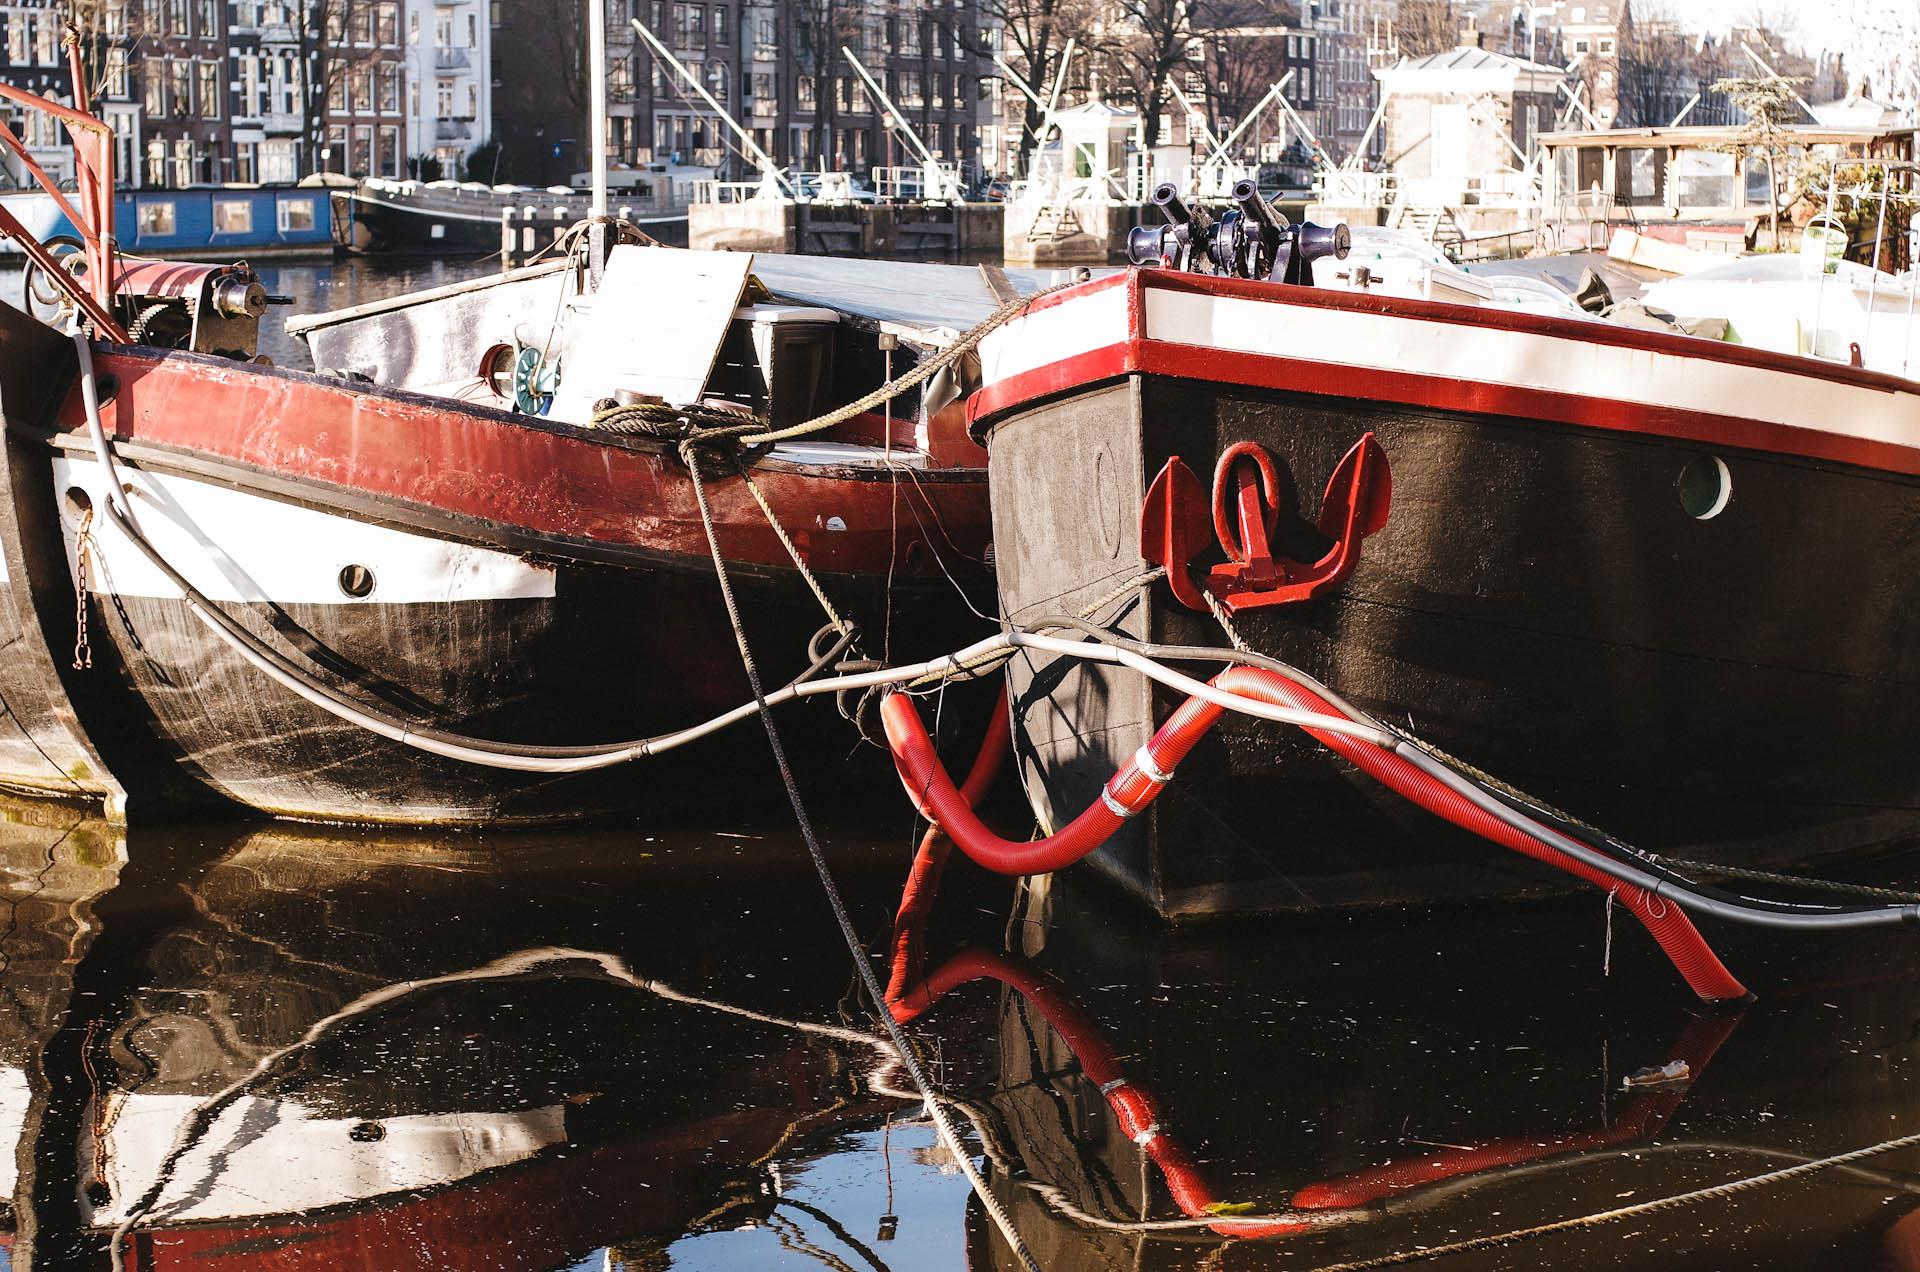 Amsterdam, Amstel